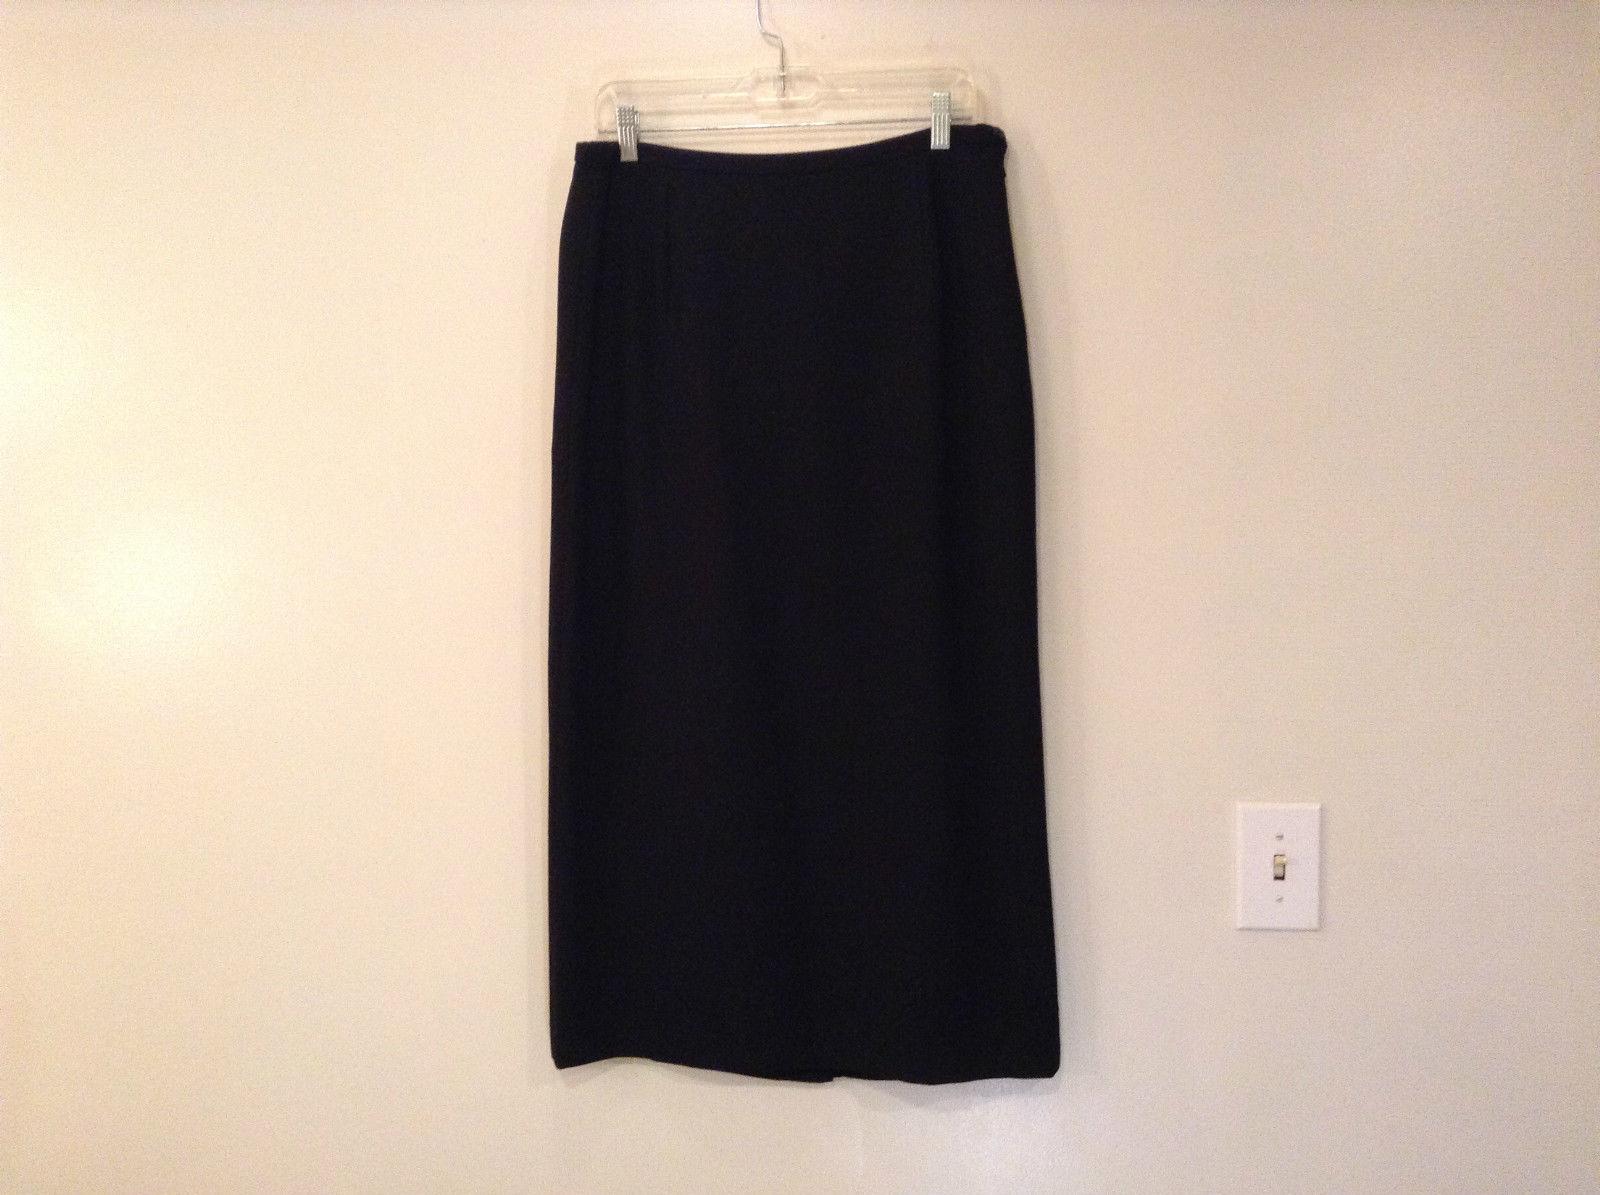 Karen Scott Black Lined Skirt Size 12 Side Zipper Back Slit No Pockets